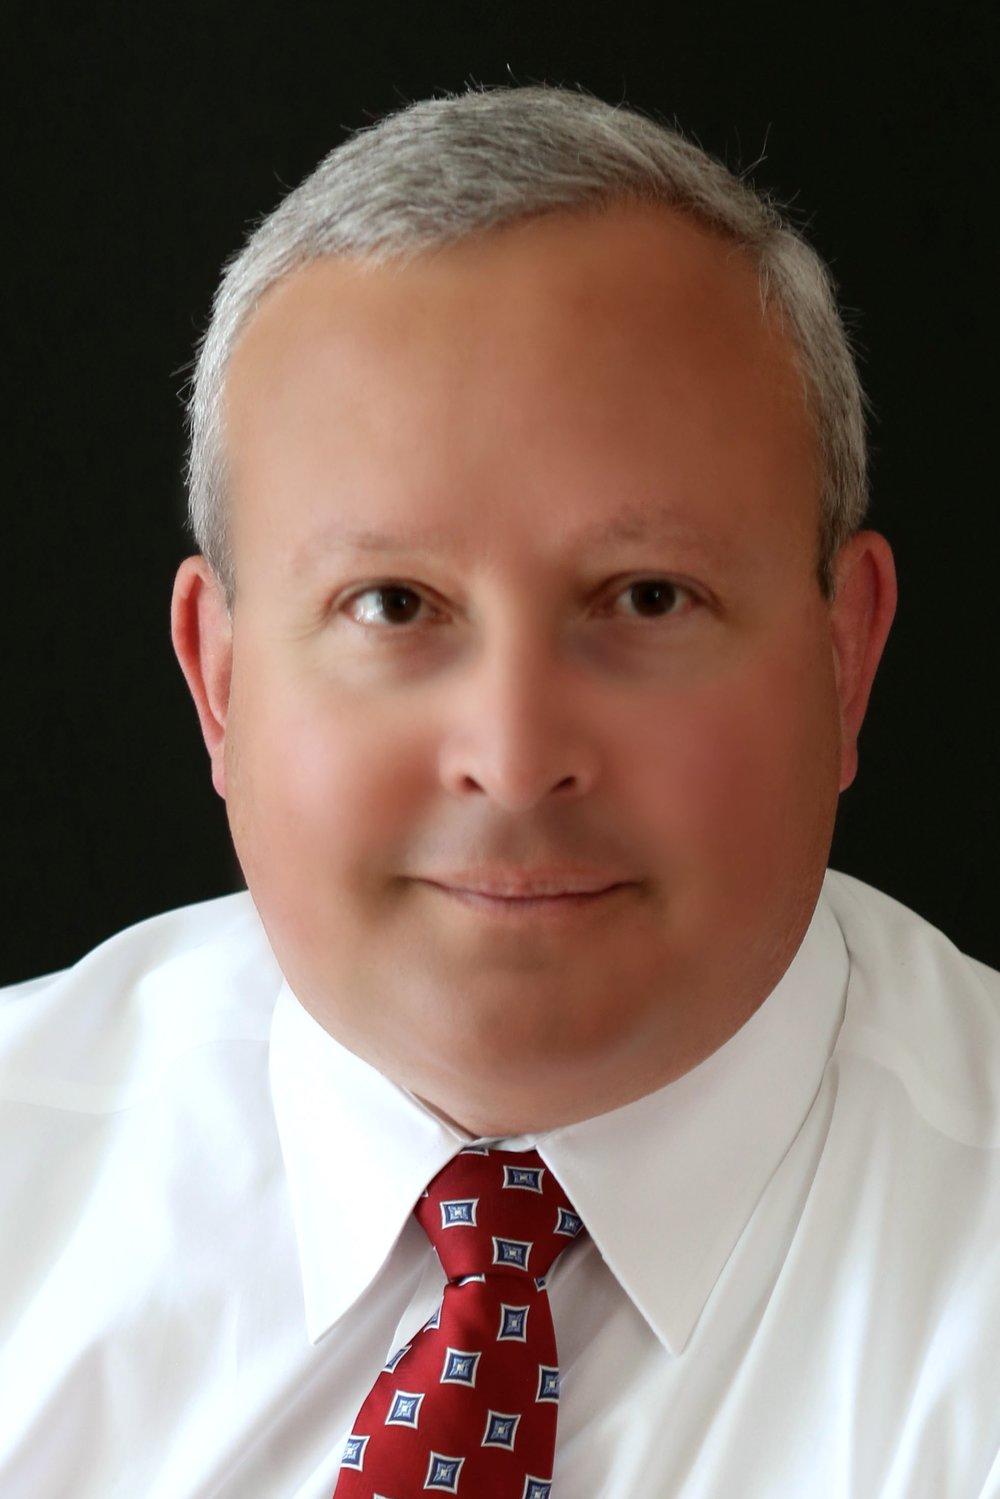 David Baxter